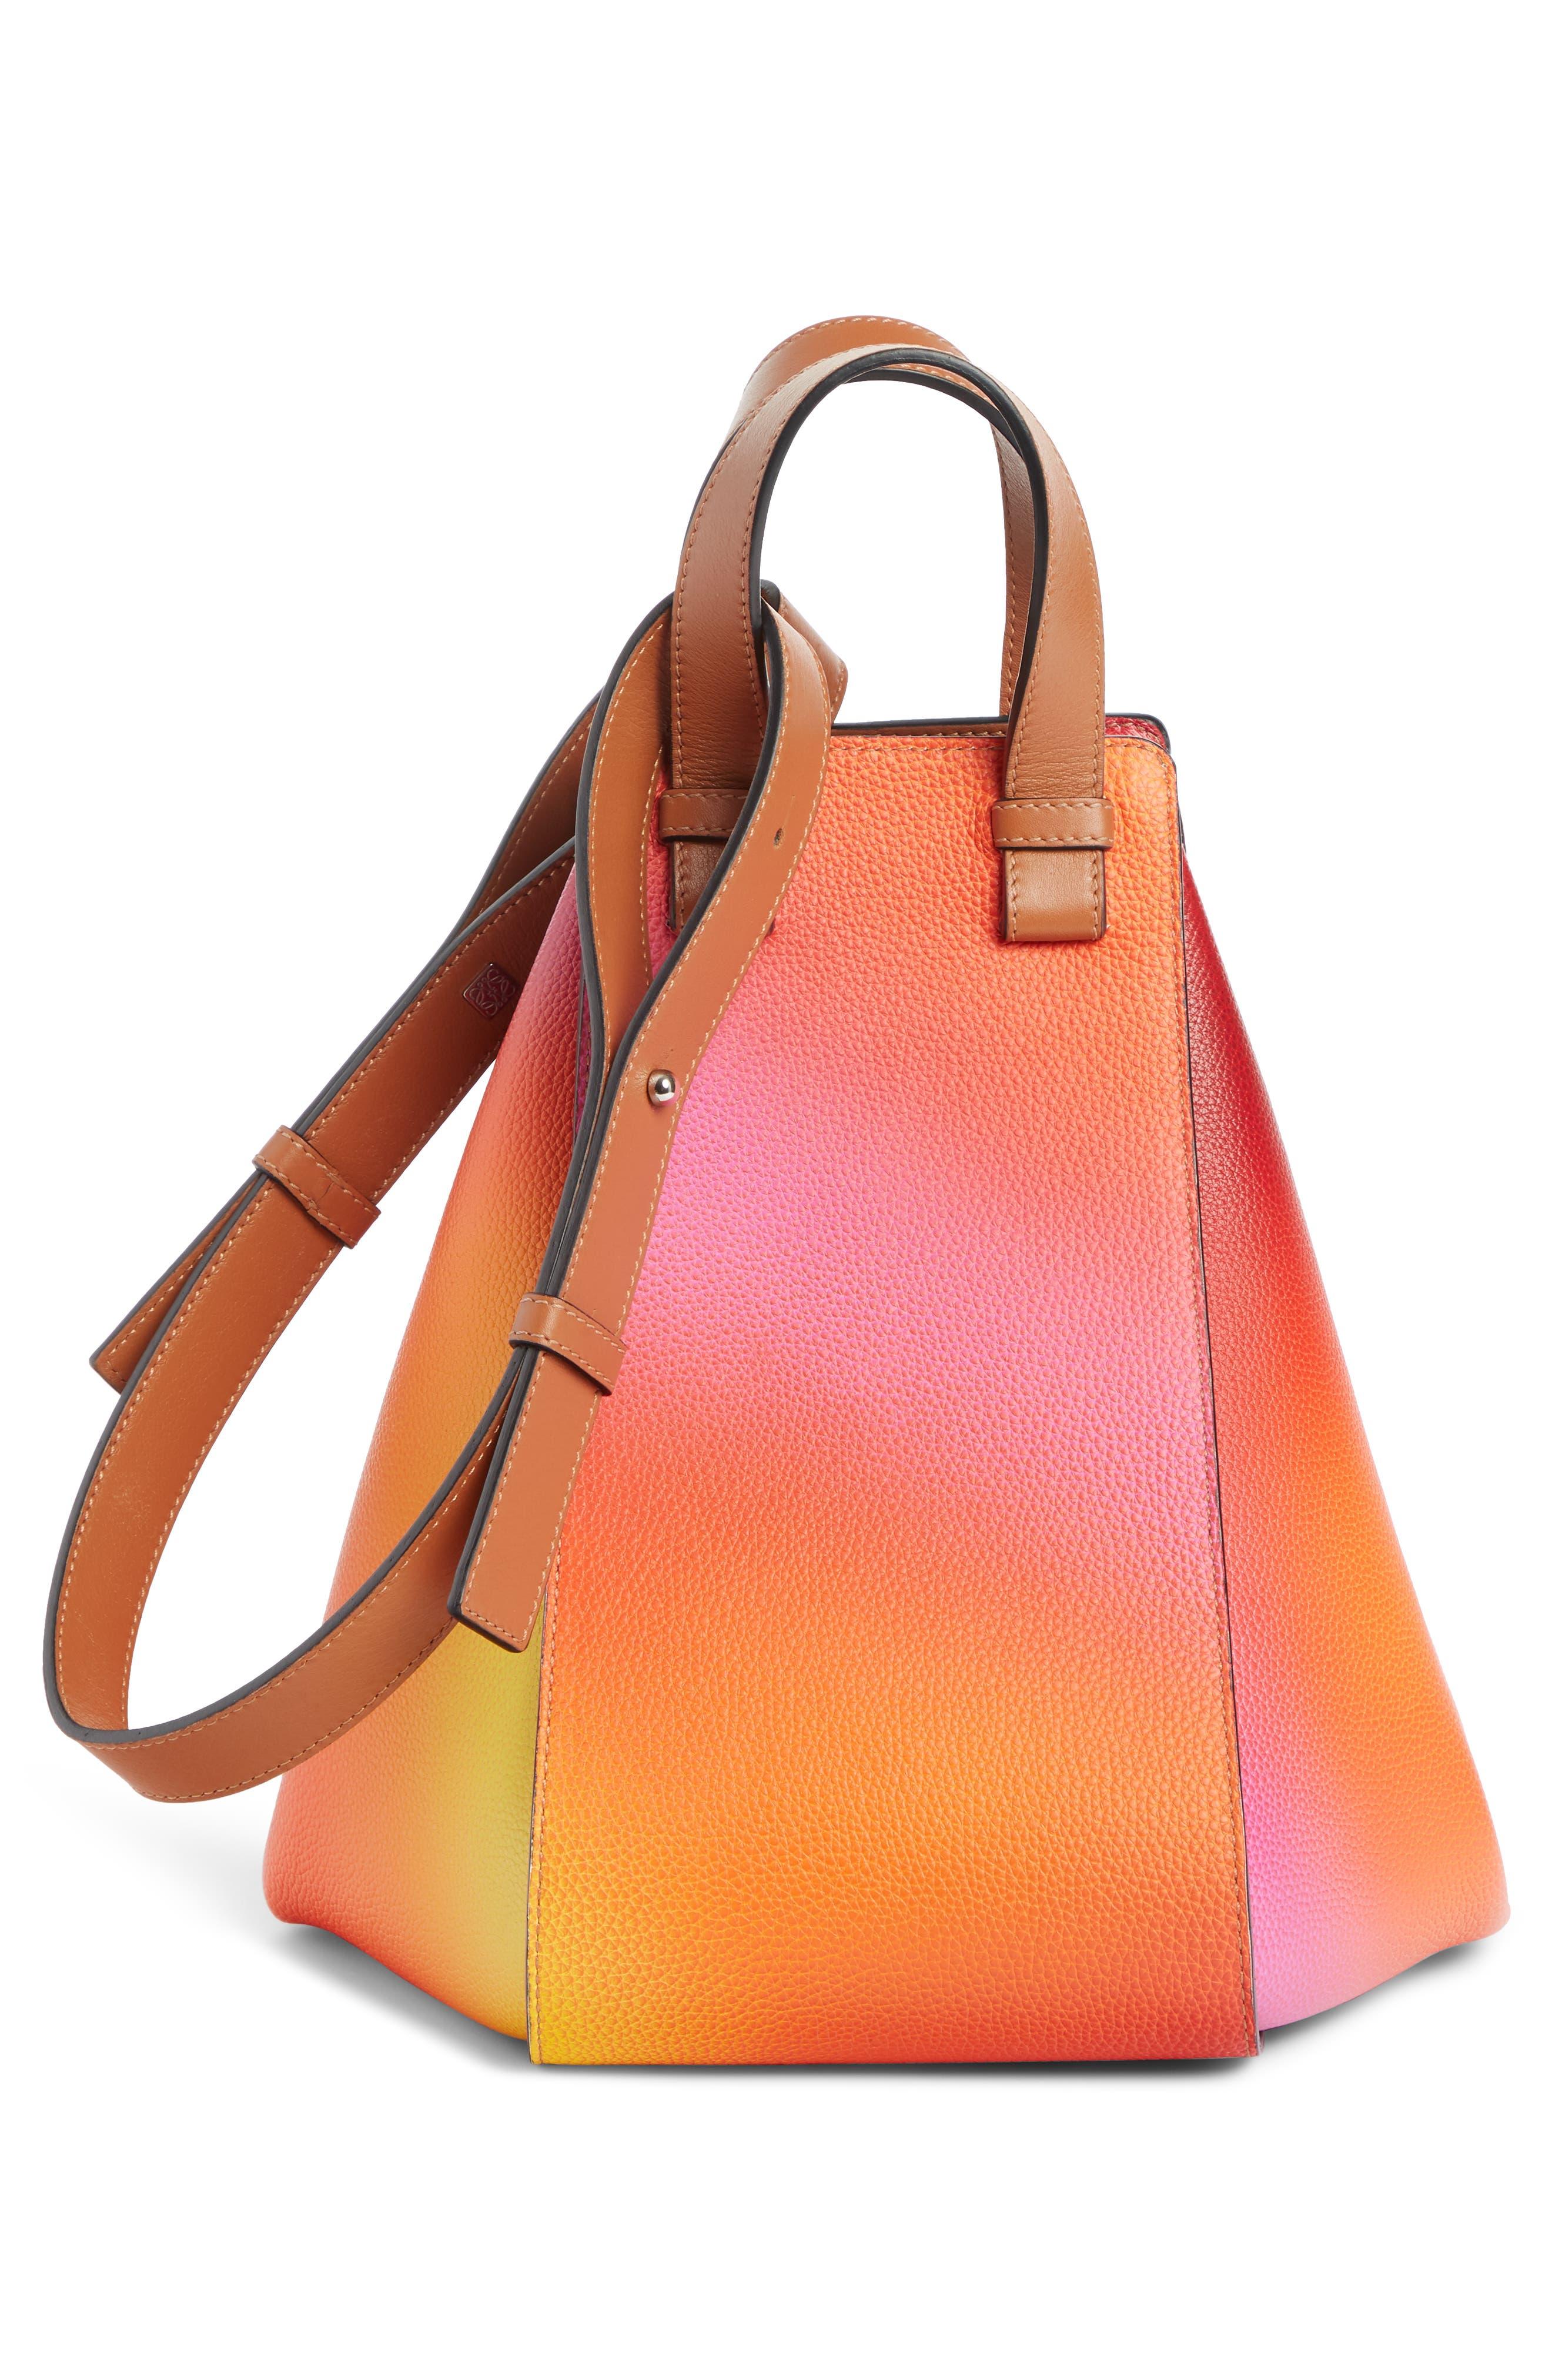 LOEWE, Medium Ombré Leather Hobo, Alternate thumbnail 3, color, ORANGE SUNSET